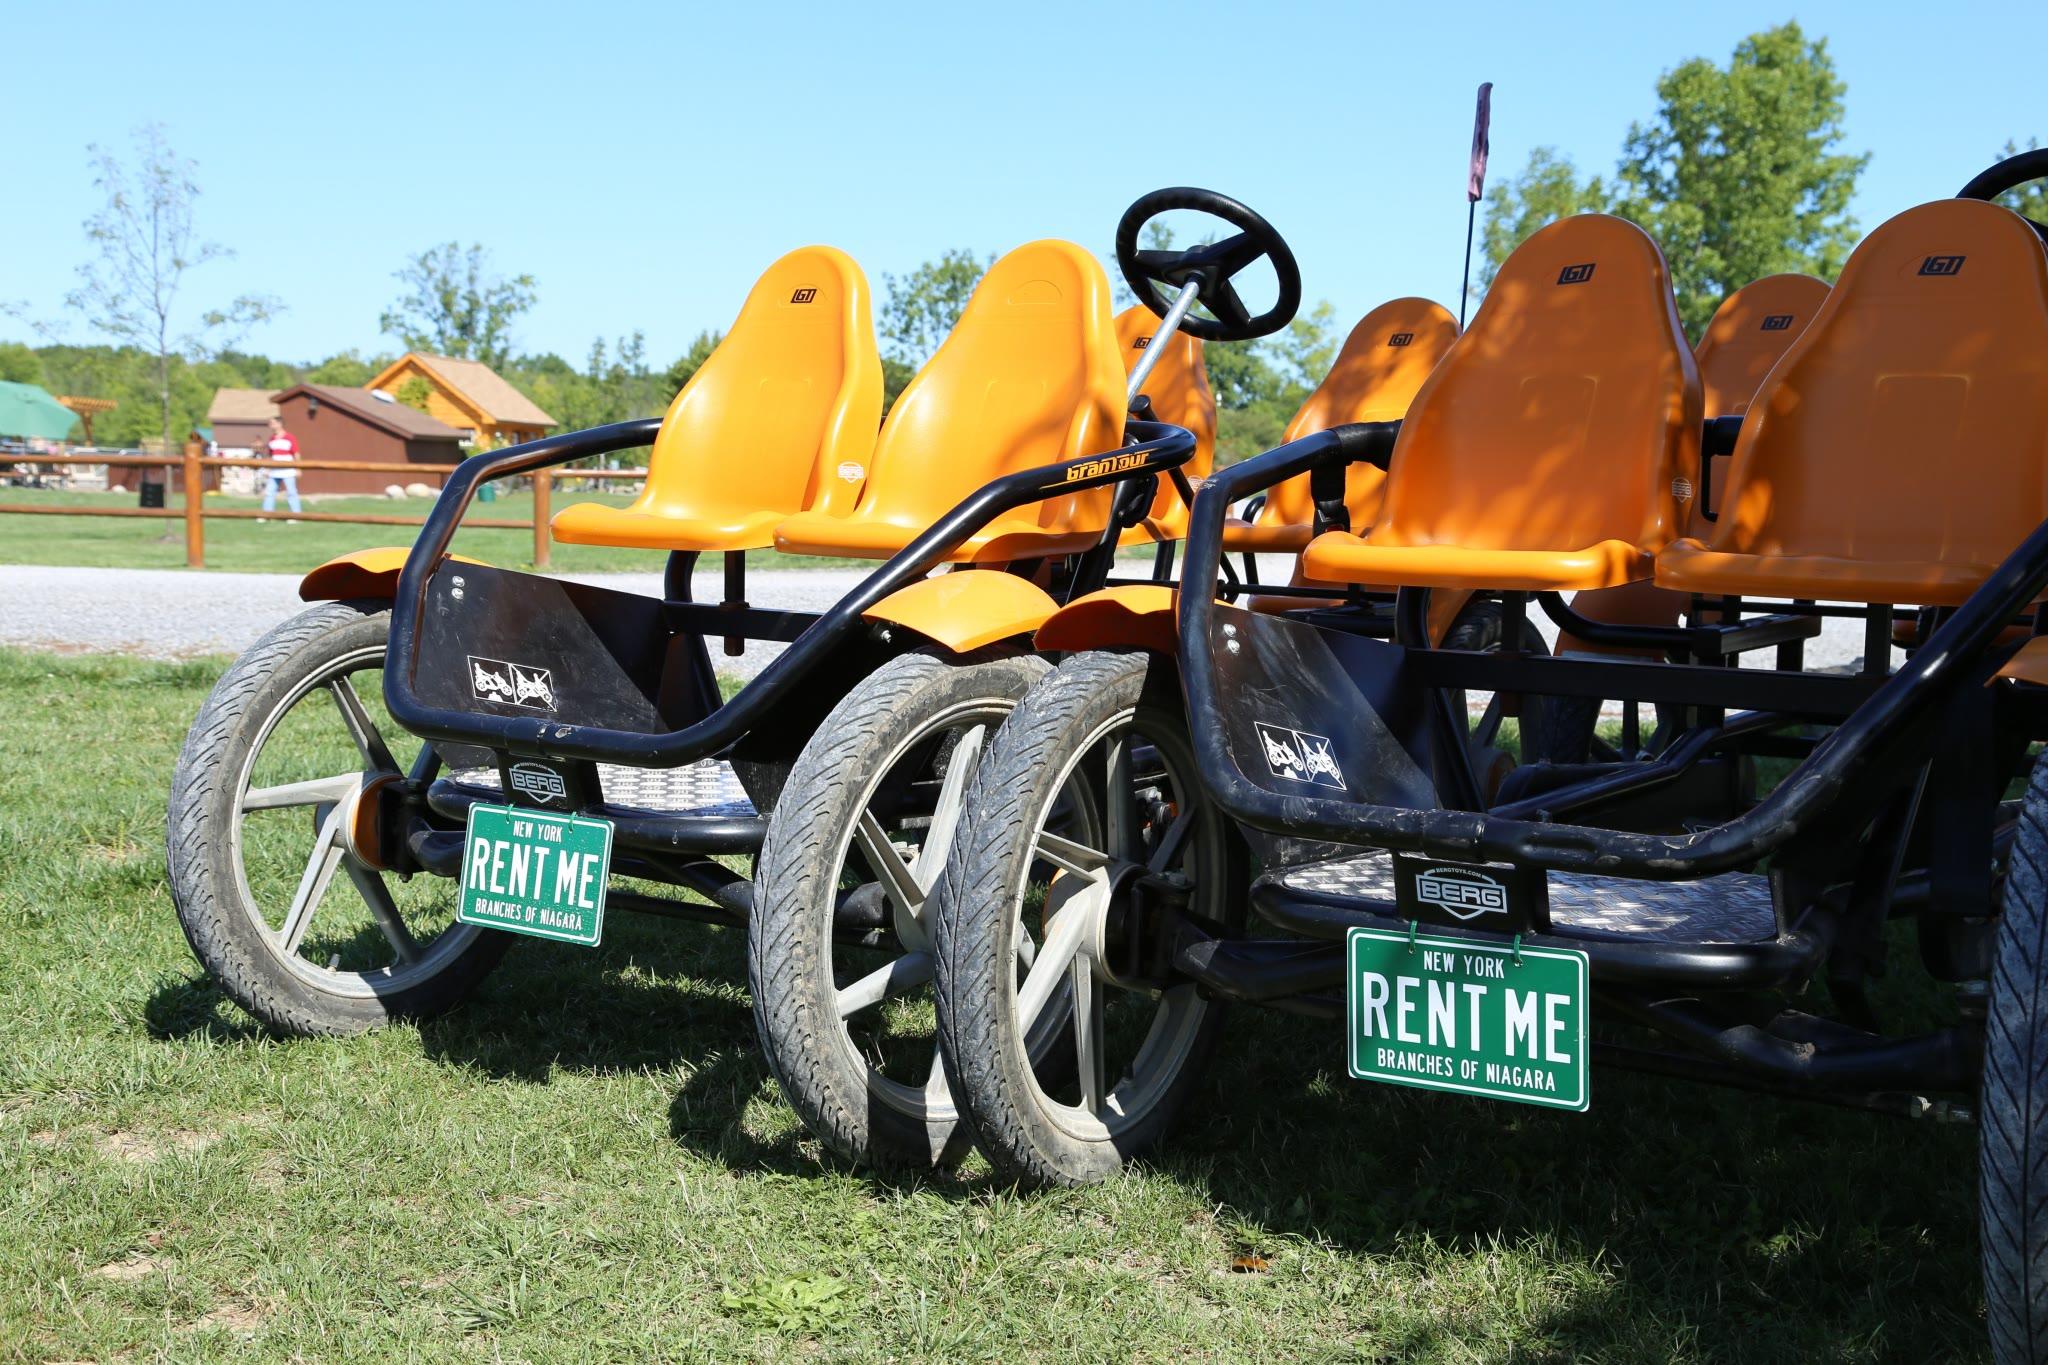 pedal bikes at Branches of Niagara campground & resort